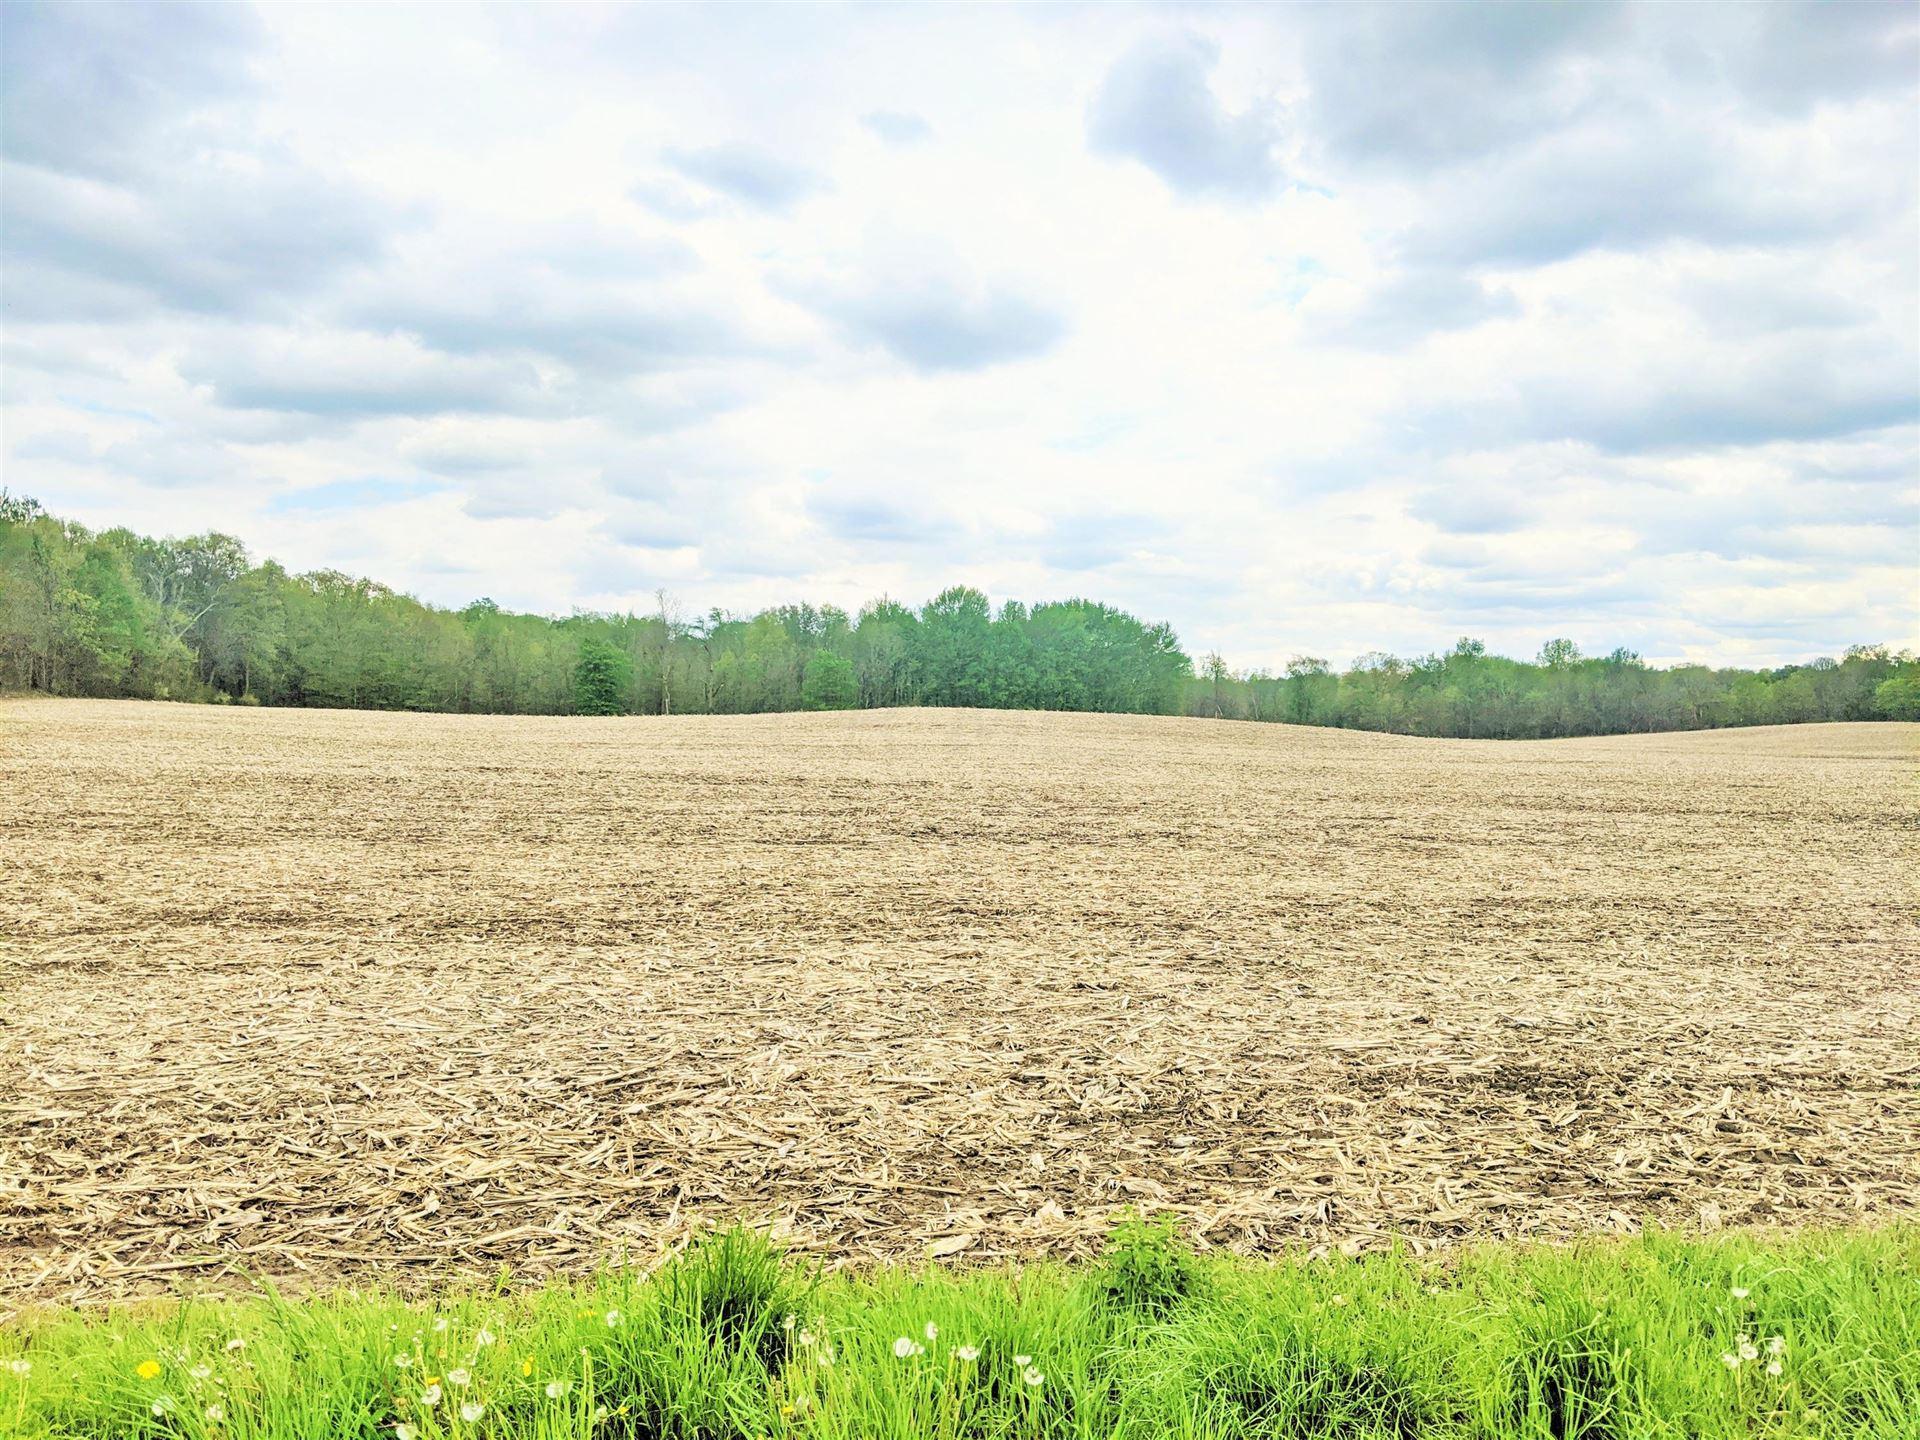 Photo of 0 Township Road 183, Cardington, OH 43315 (MLS # 221015911)